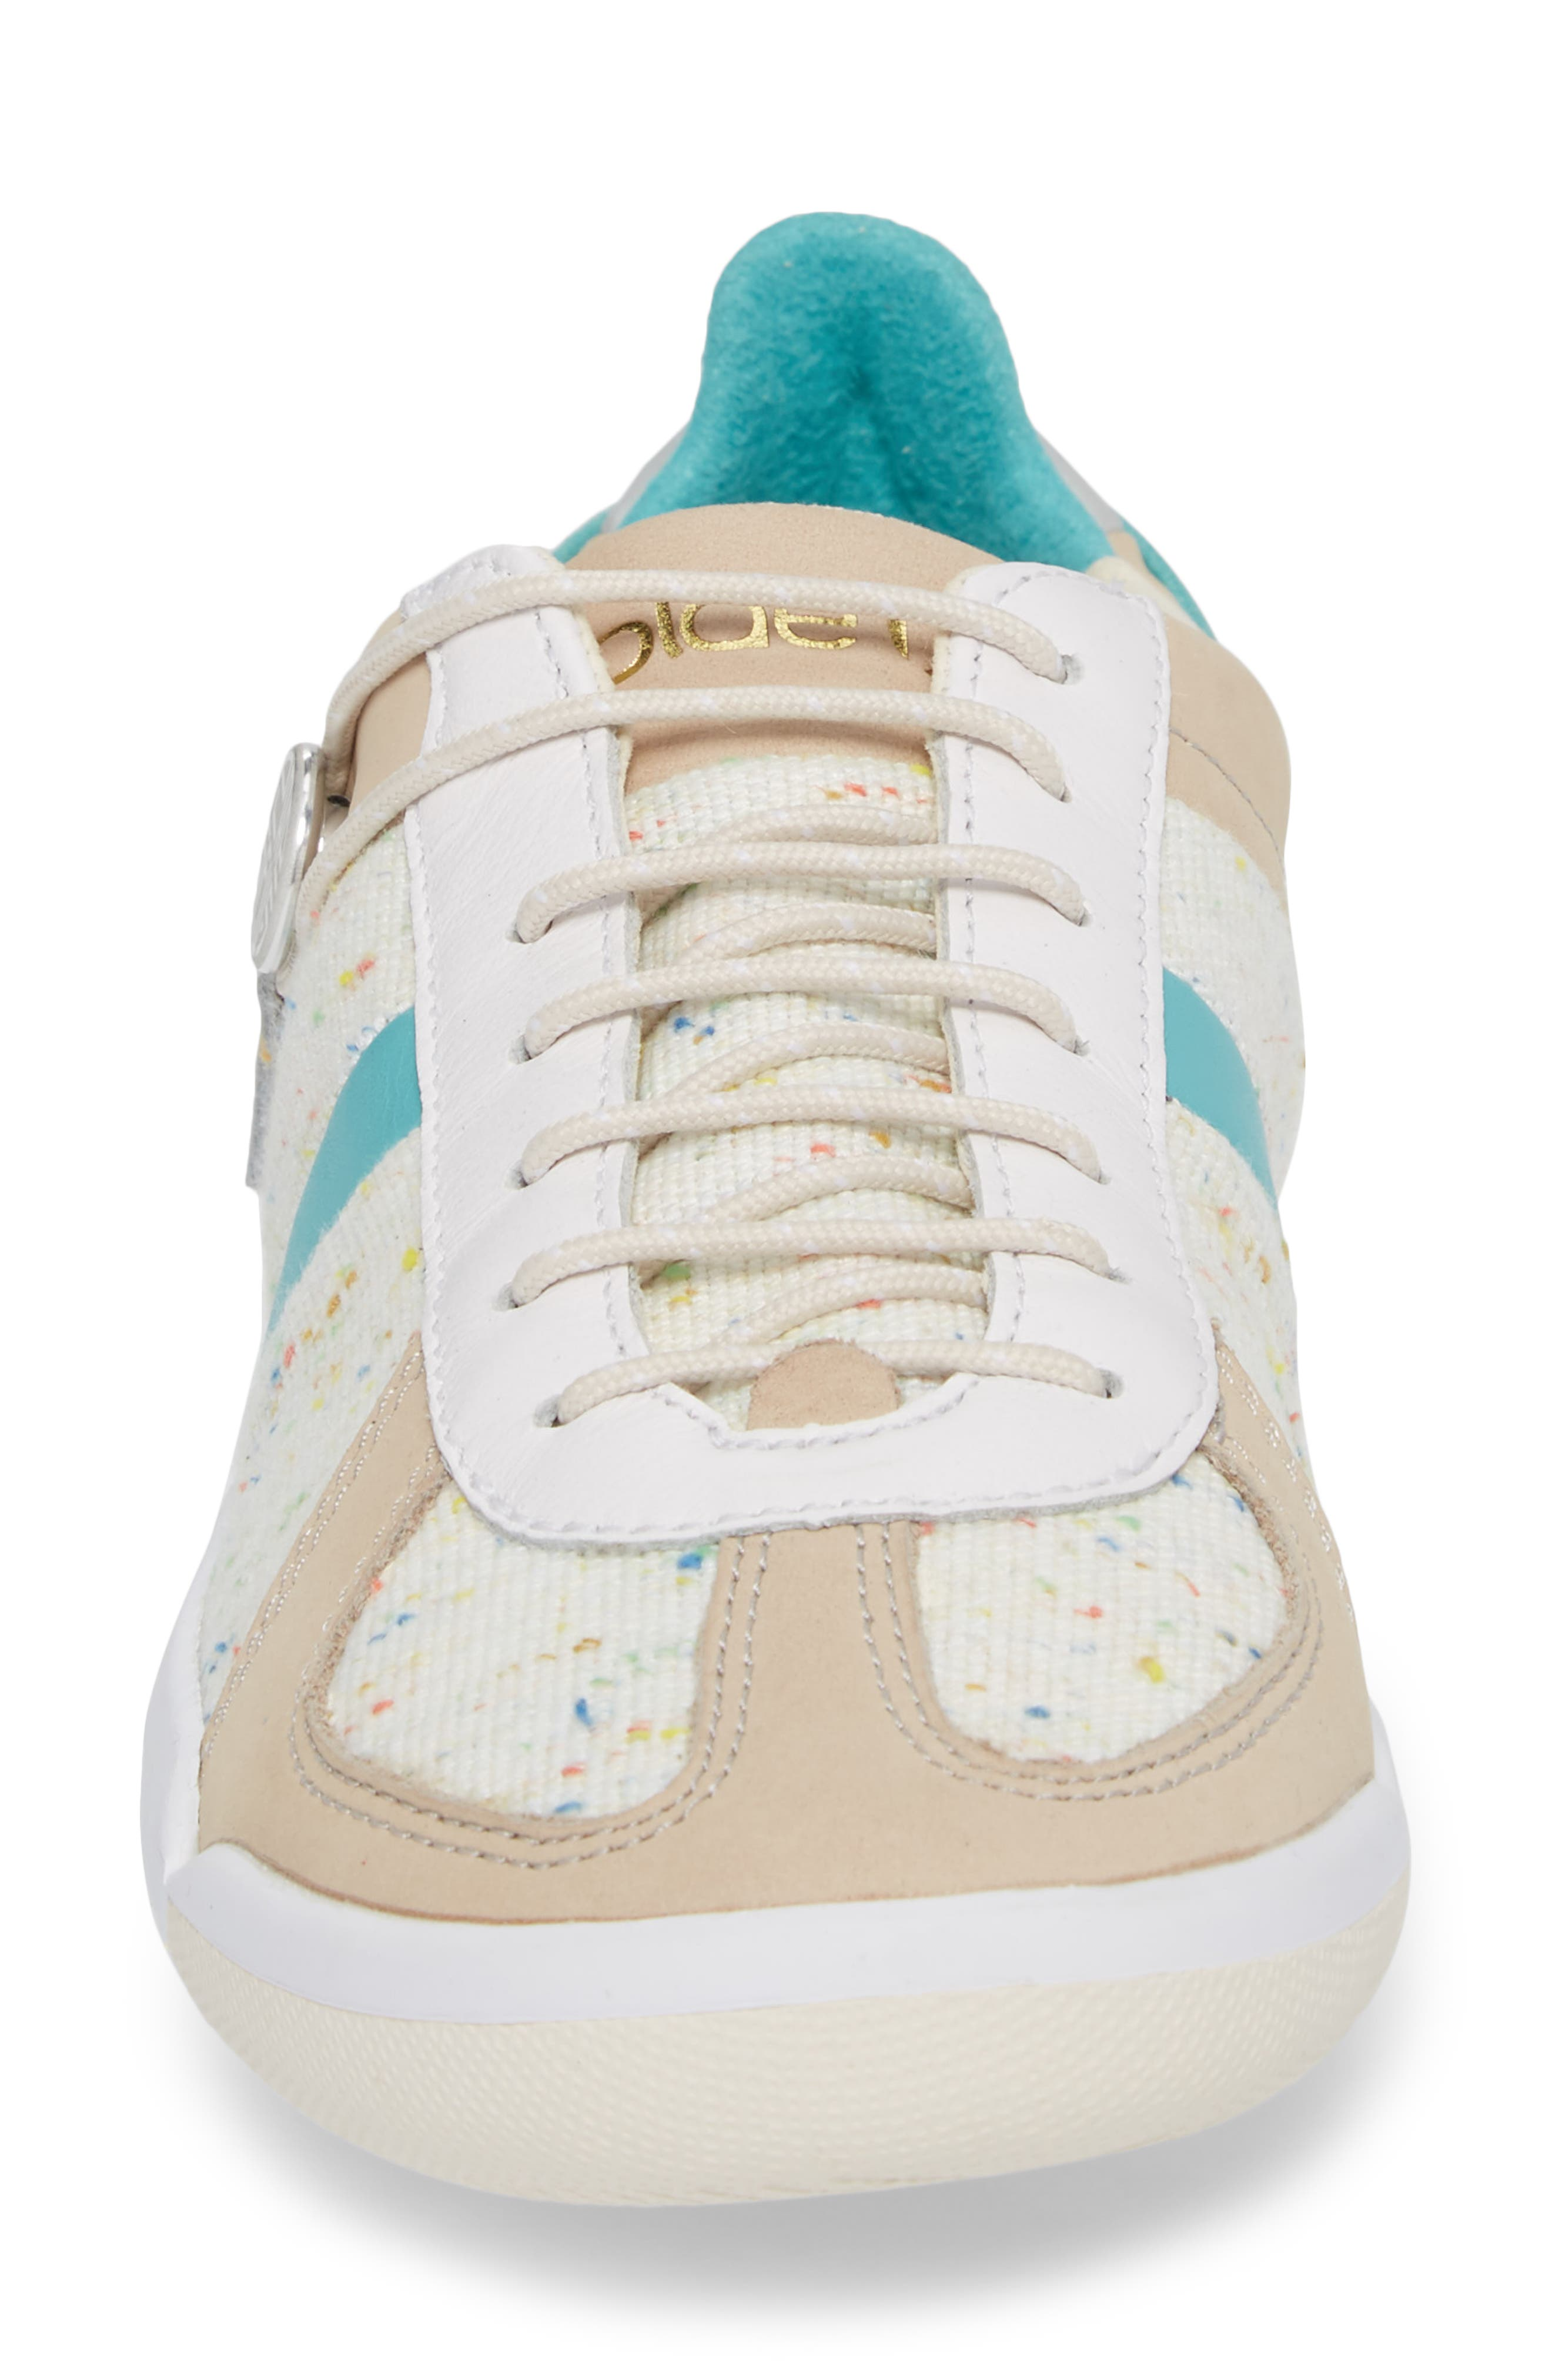 Butler Sneaker,                             Alternate thumbnail 4, color,                             Turtledove Leather